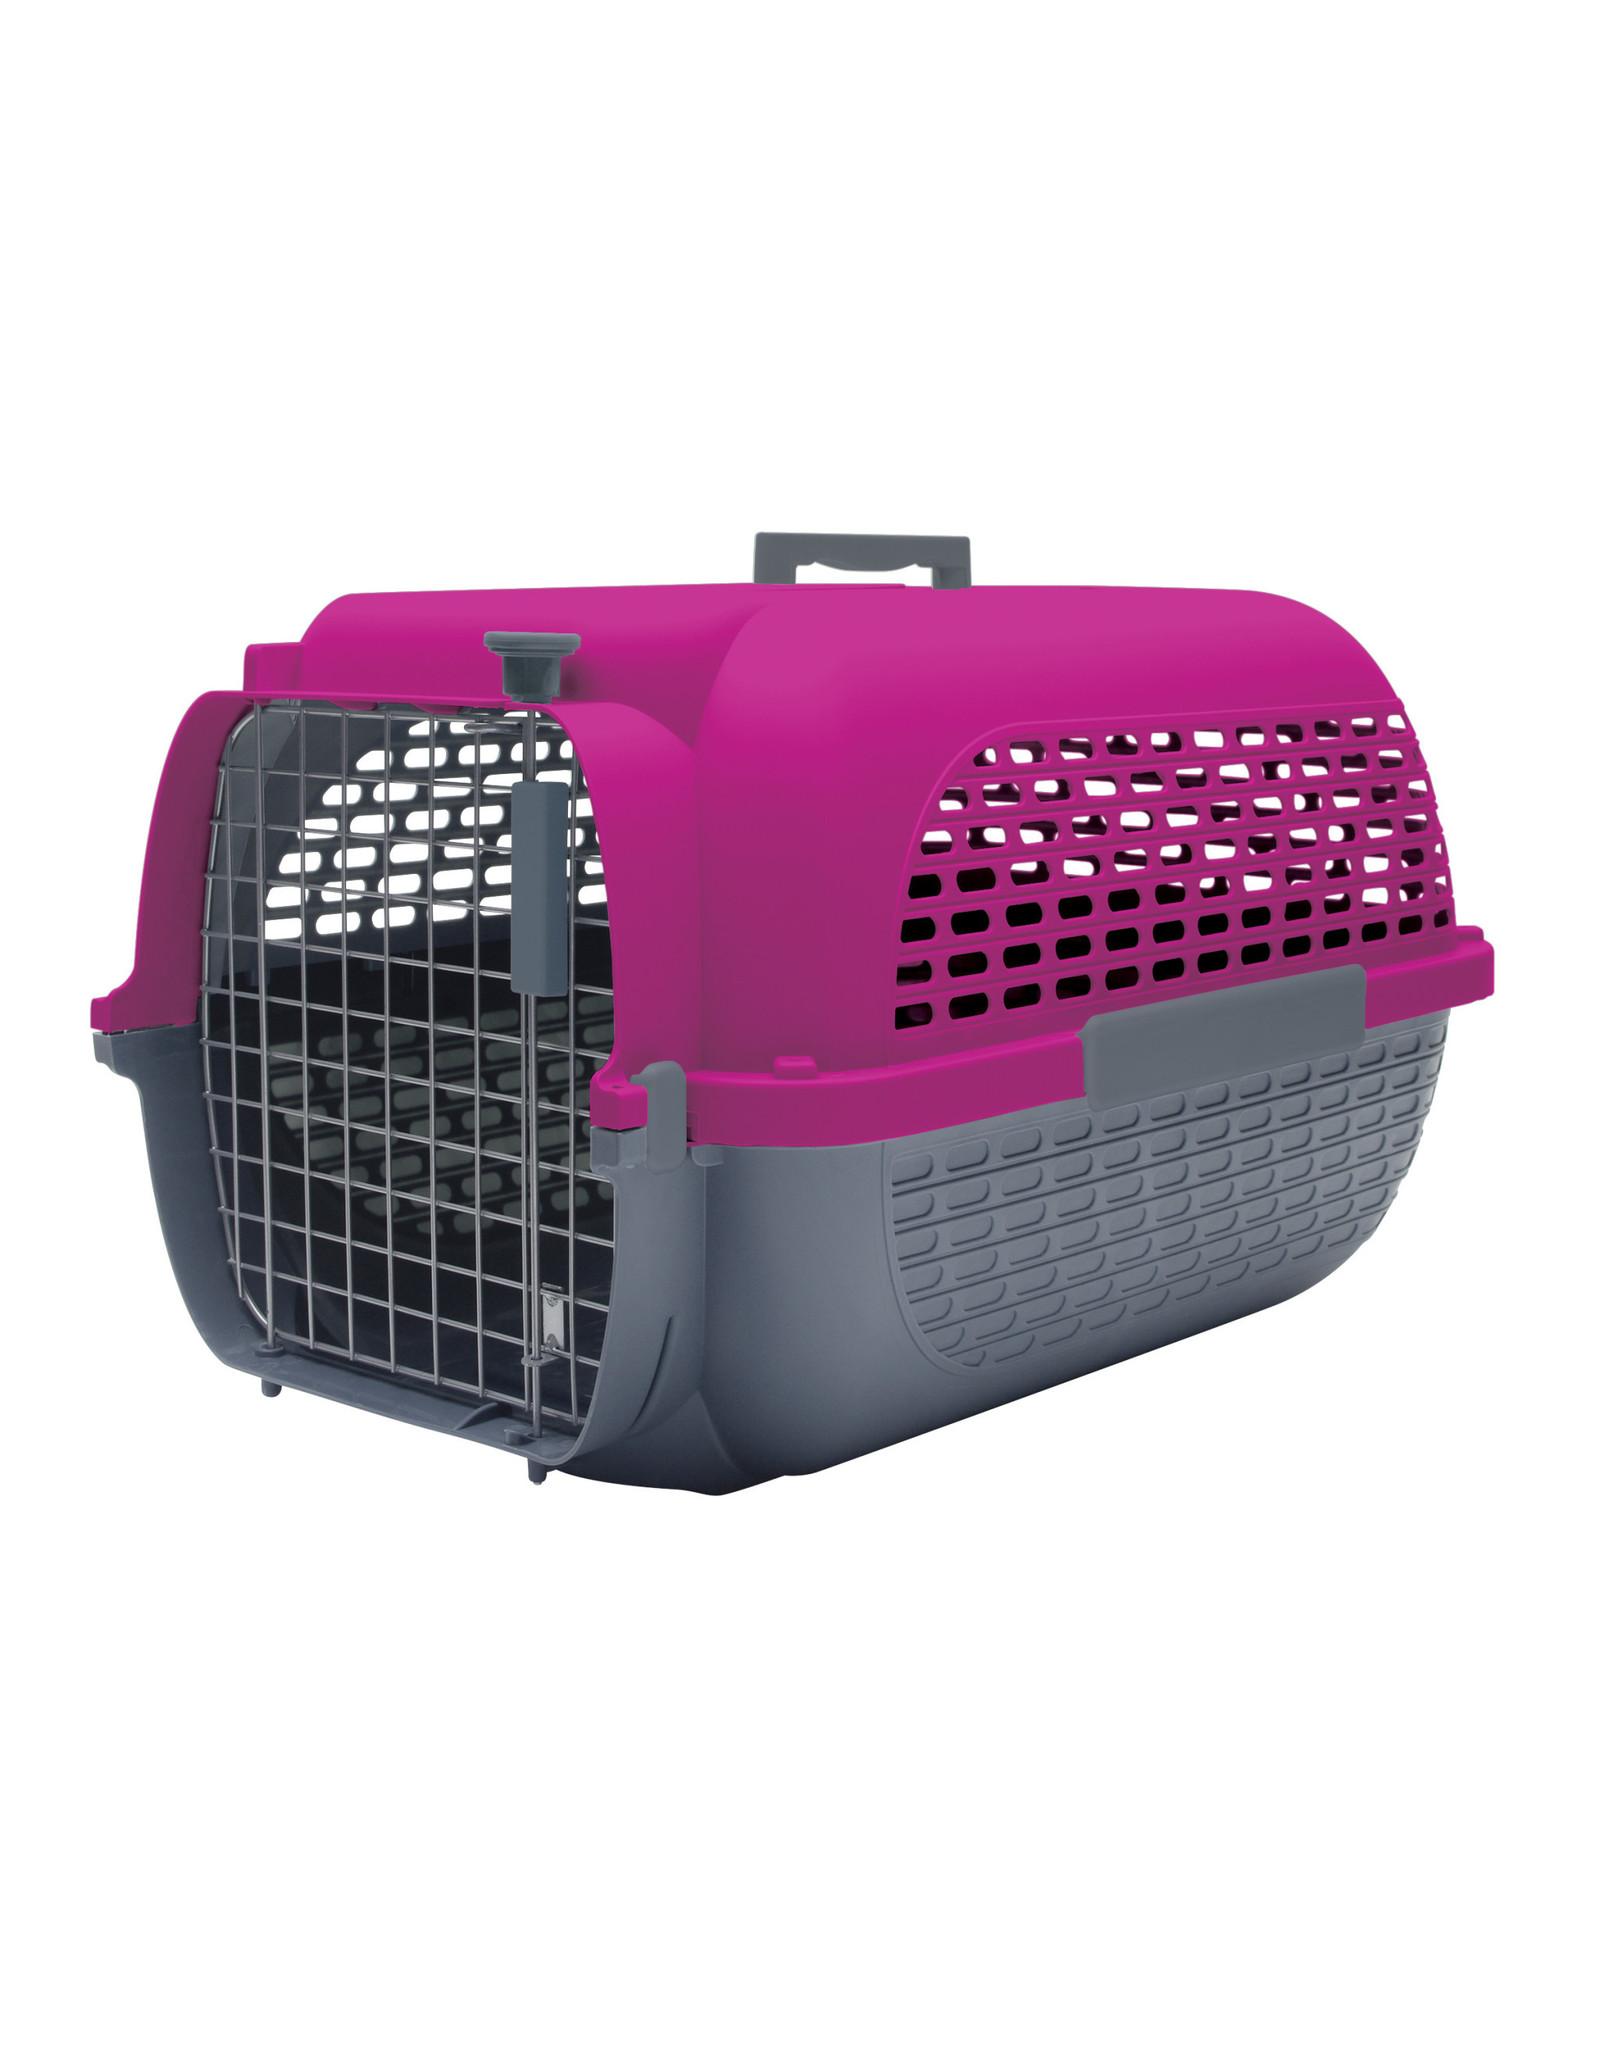 "DogIt Voyageur Dog Carrier Fuchsia/Charcoal Small 48.3L x 32.6W x 28cmH (19x12.8x11"")"